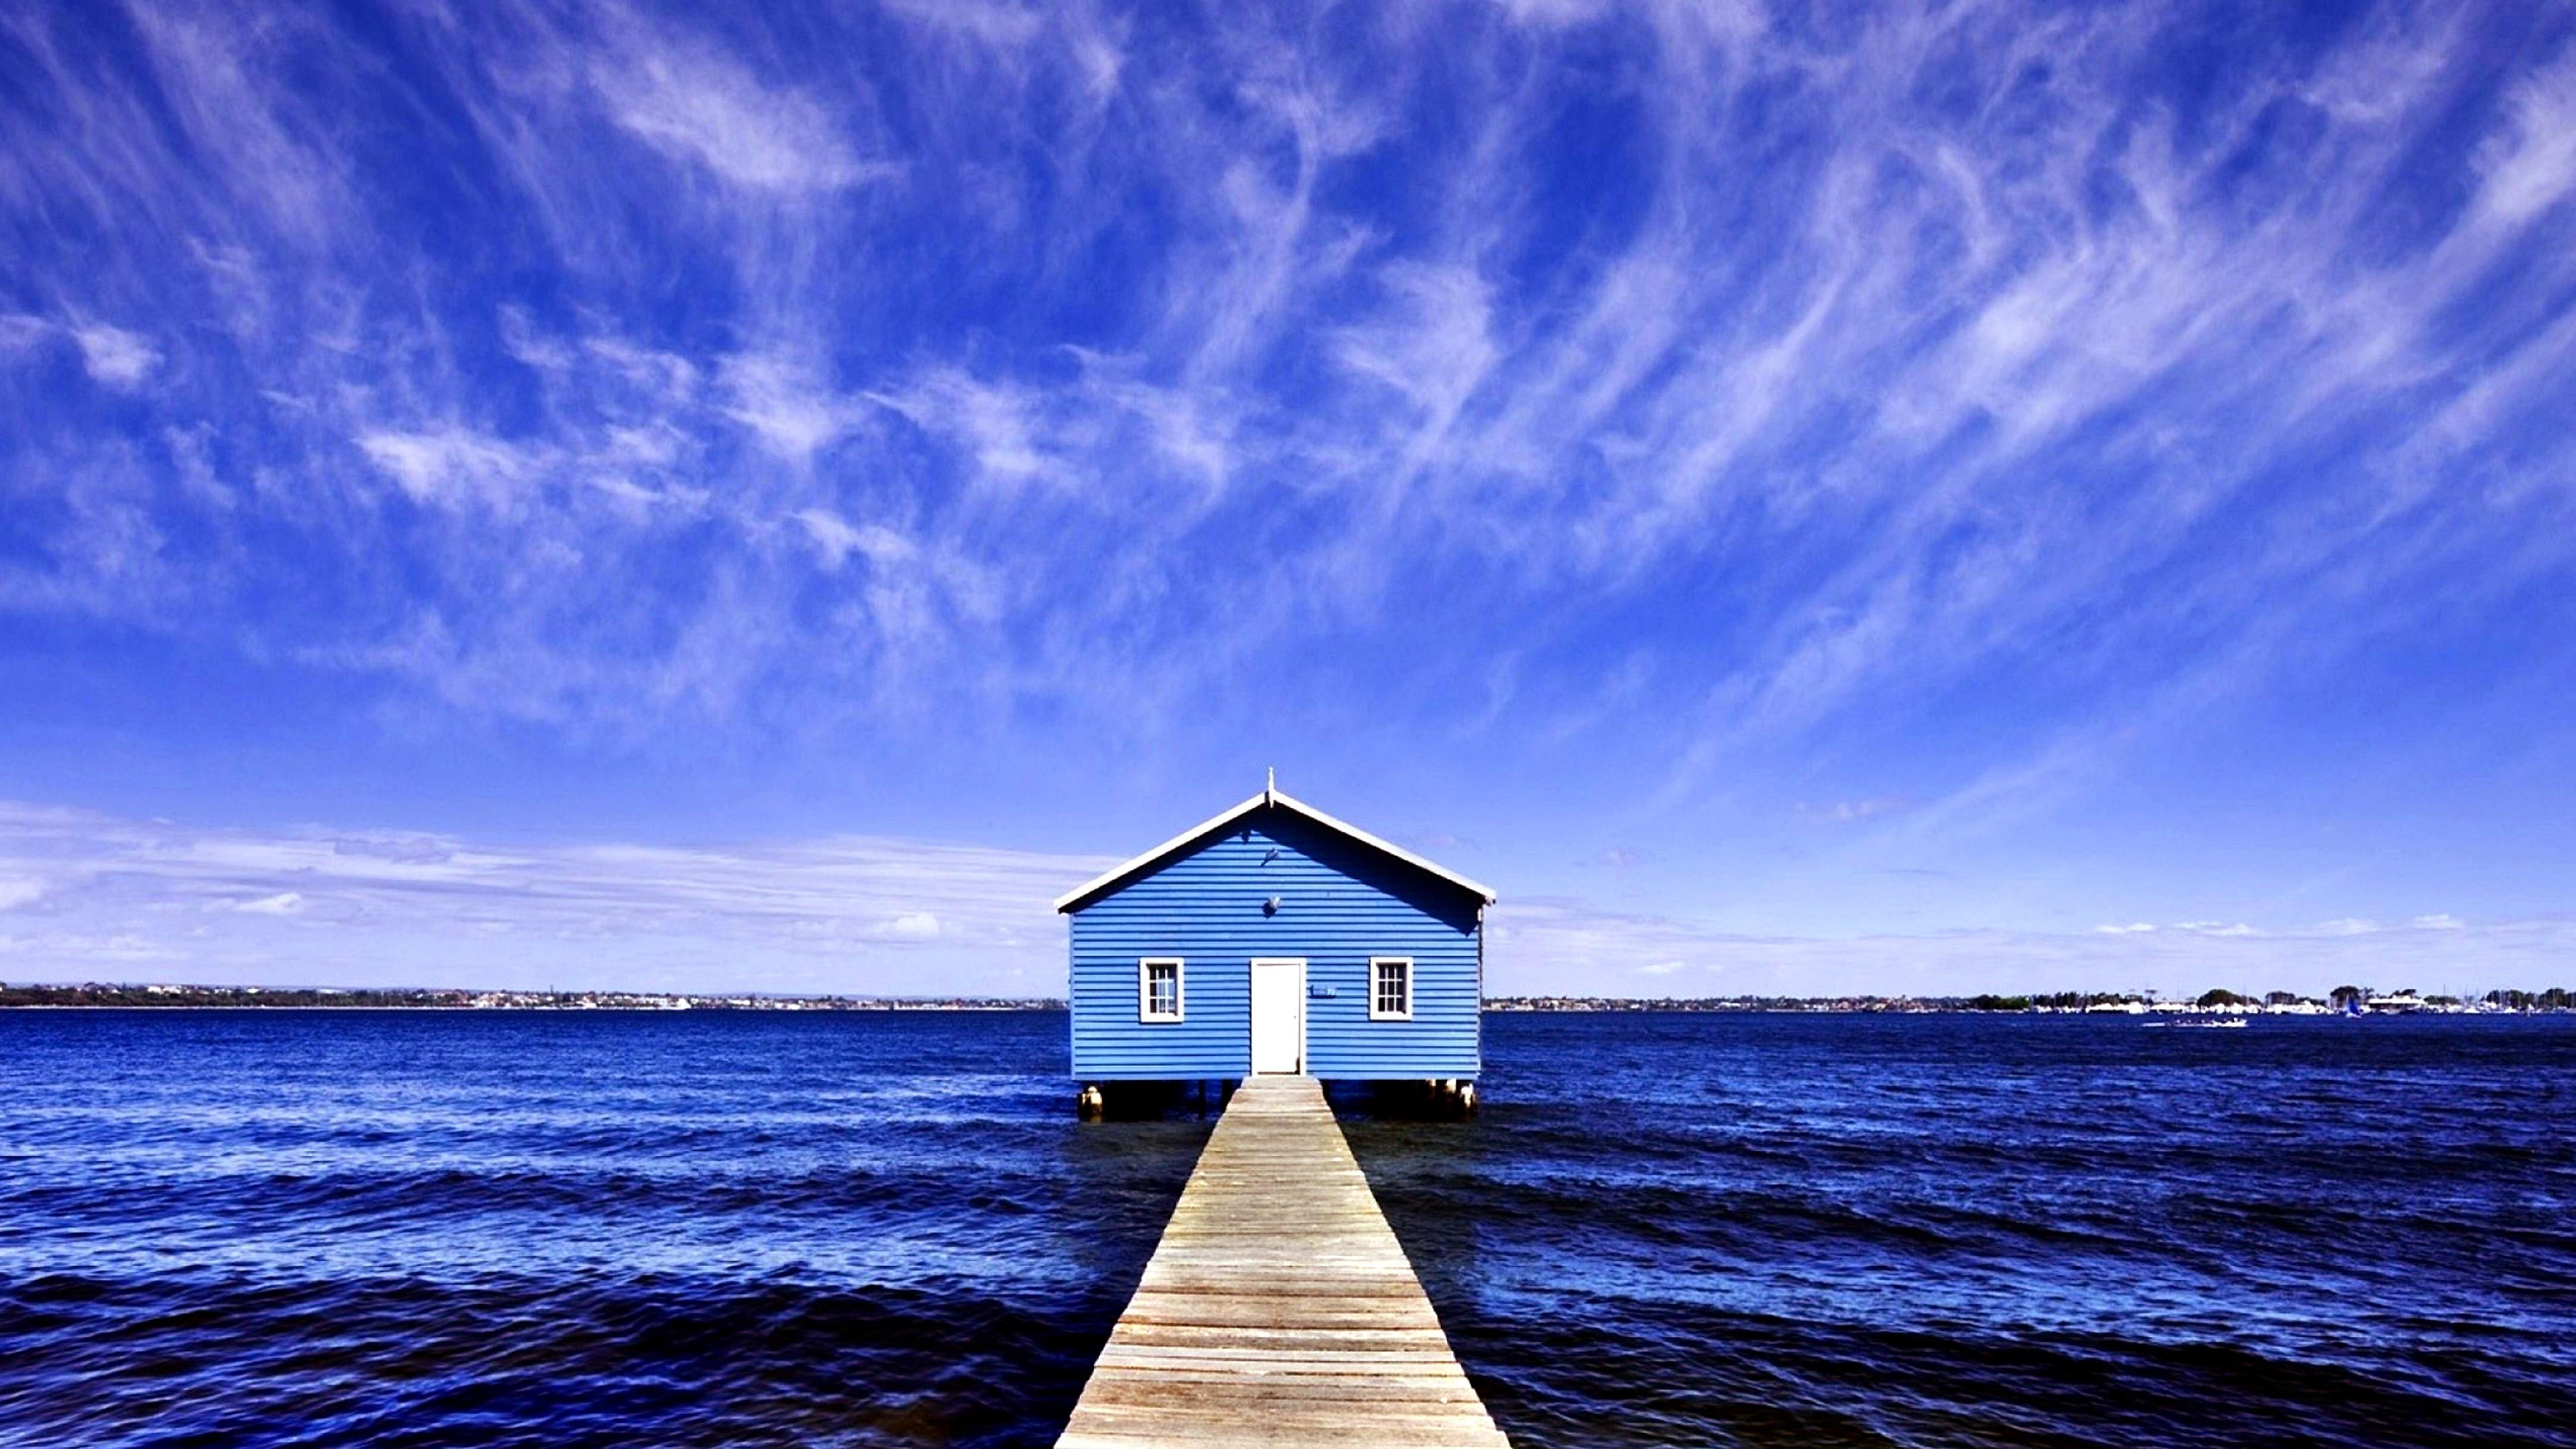 Blue Boat House On Matilda Bay (Australia) 4K UltraHD ...